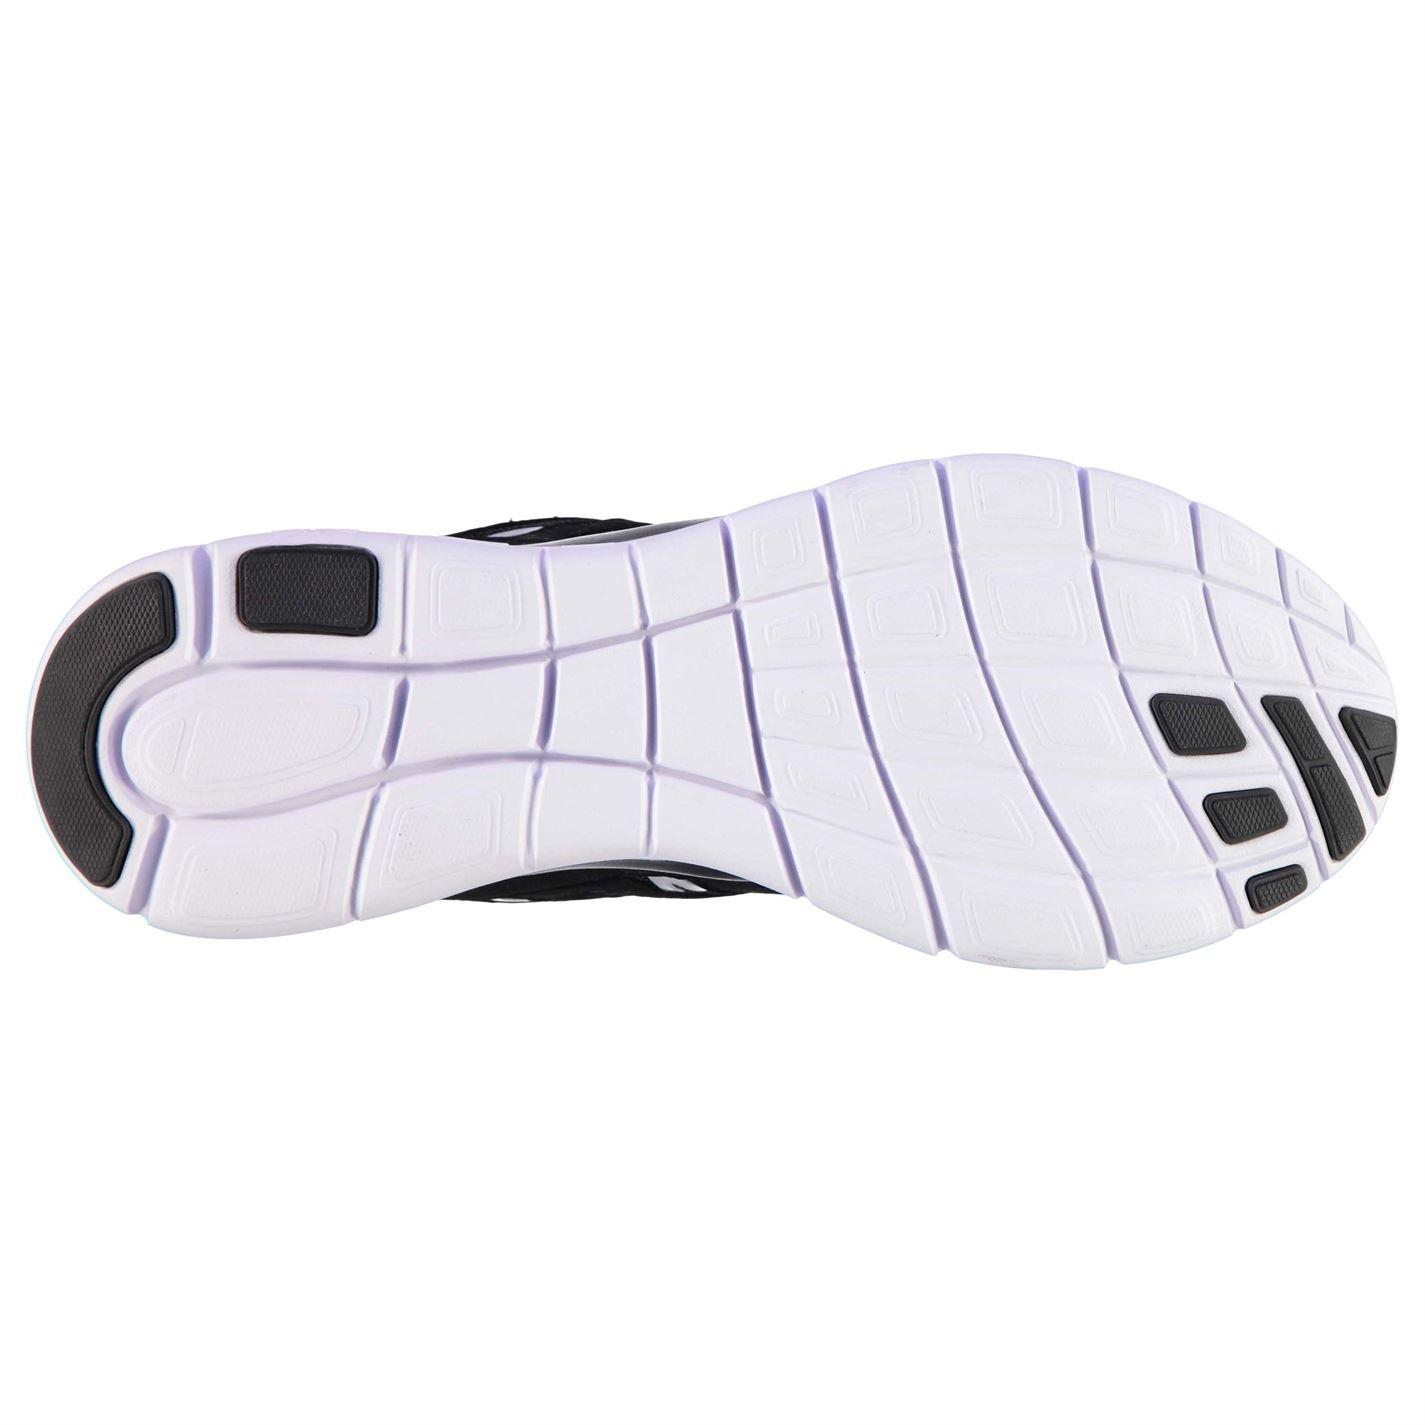 Karrimor-Mens-Duma-Trainers-Lace-Up-Sports-Running-Cross-Training-Shoes thumbnail 17